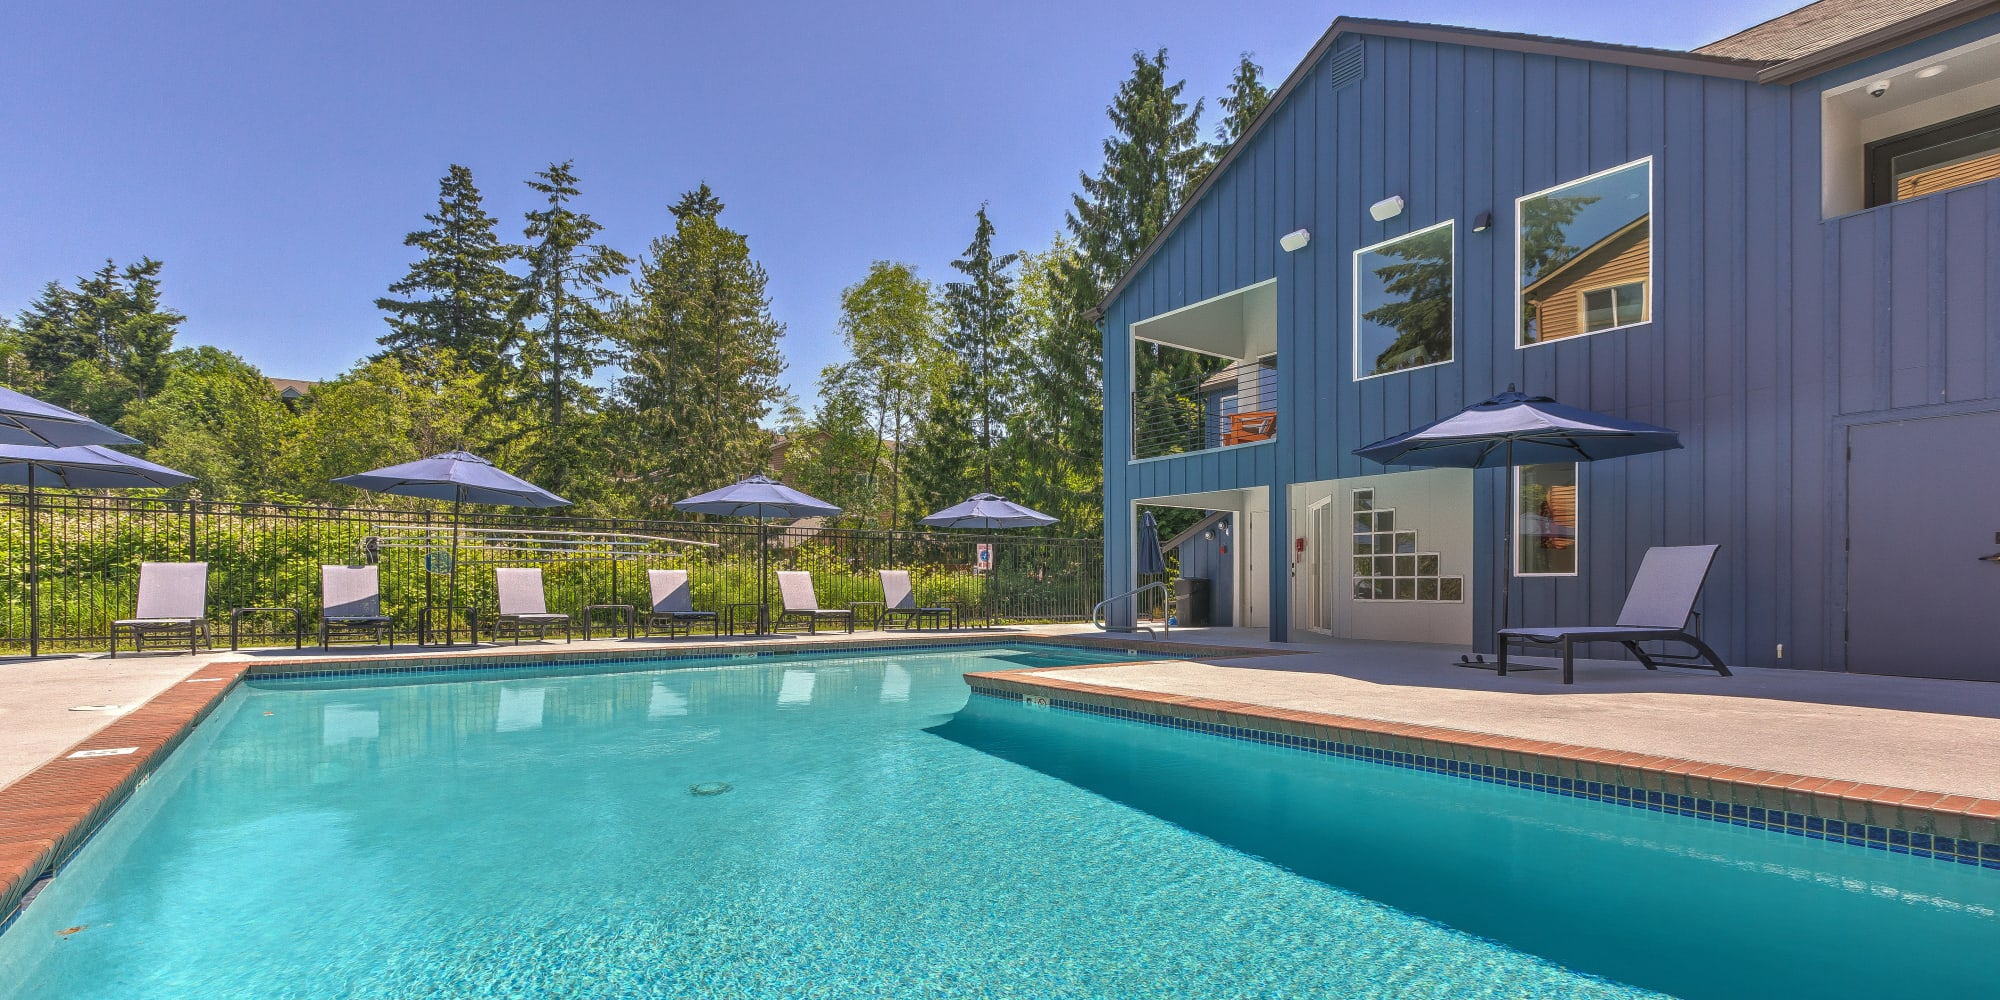 Apartments in Everett, Washington, at Sofi Lakeside